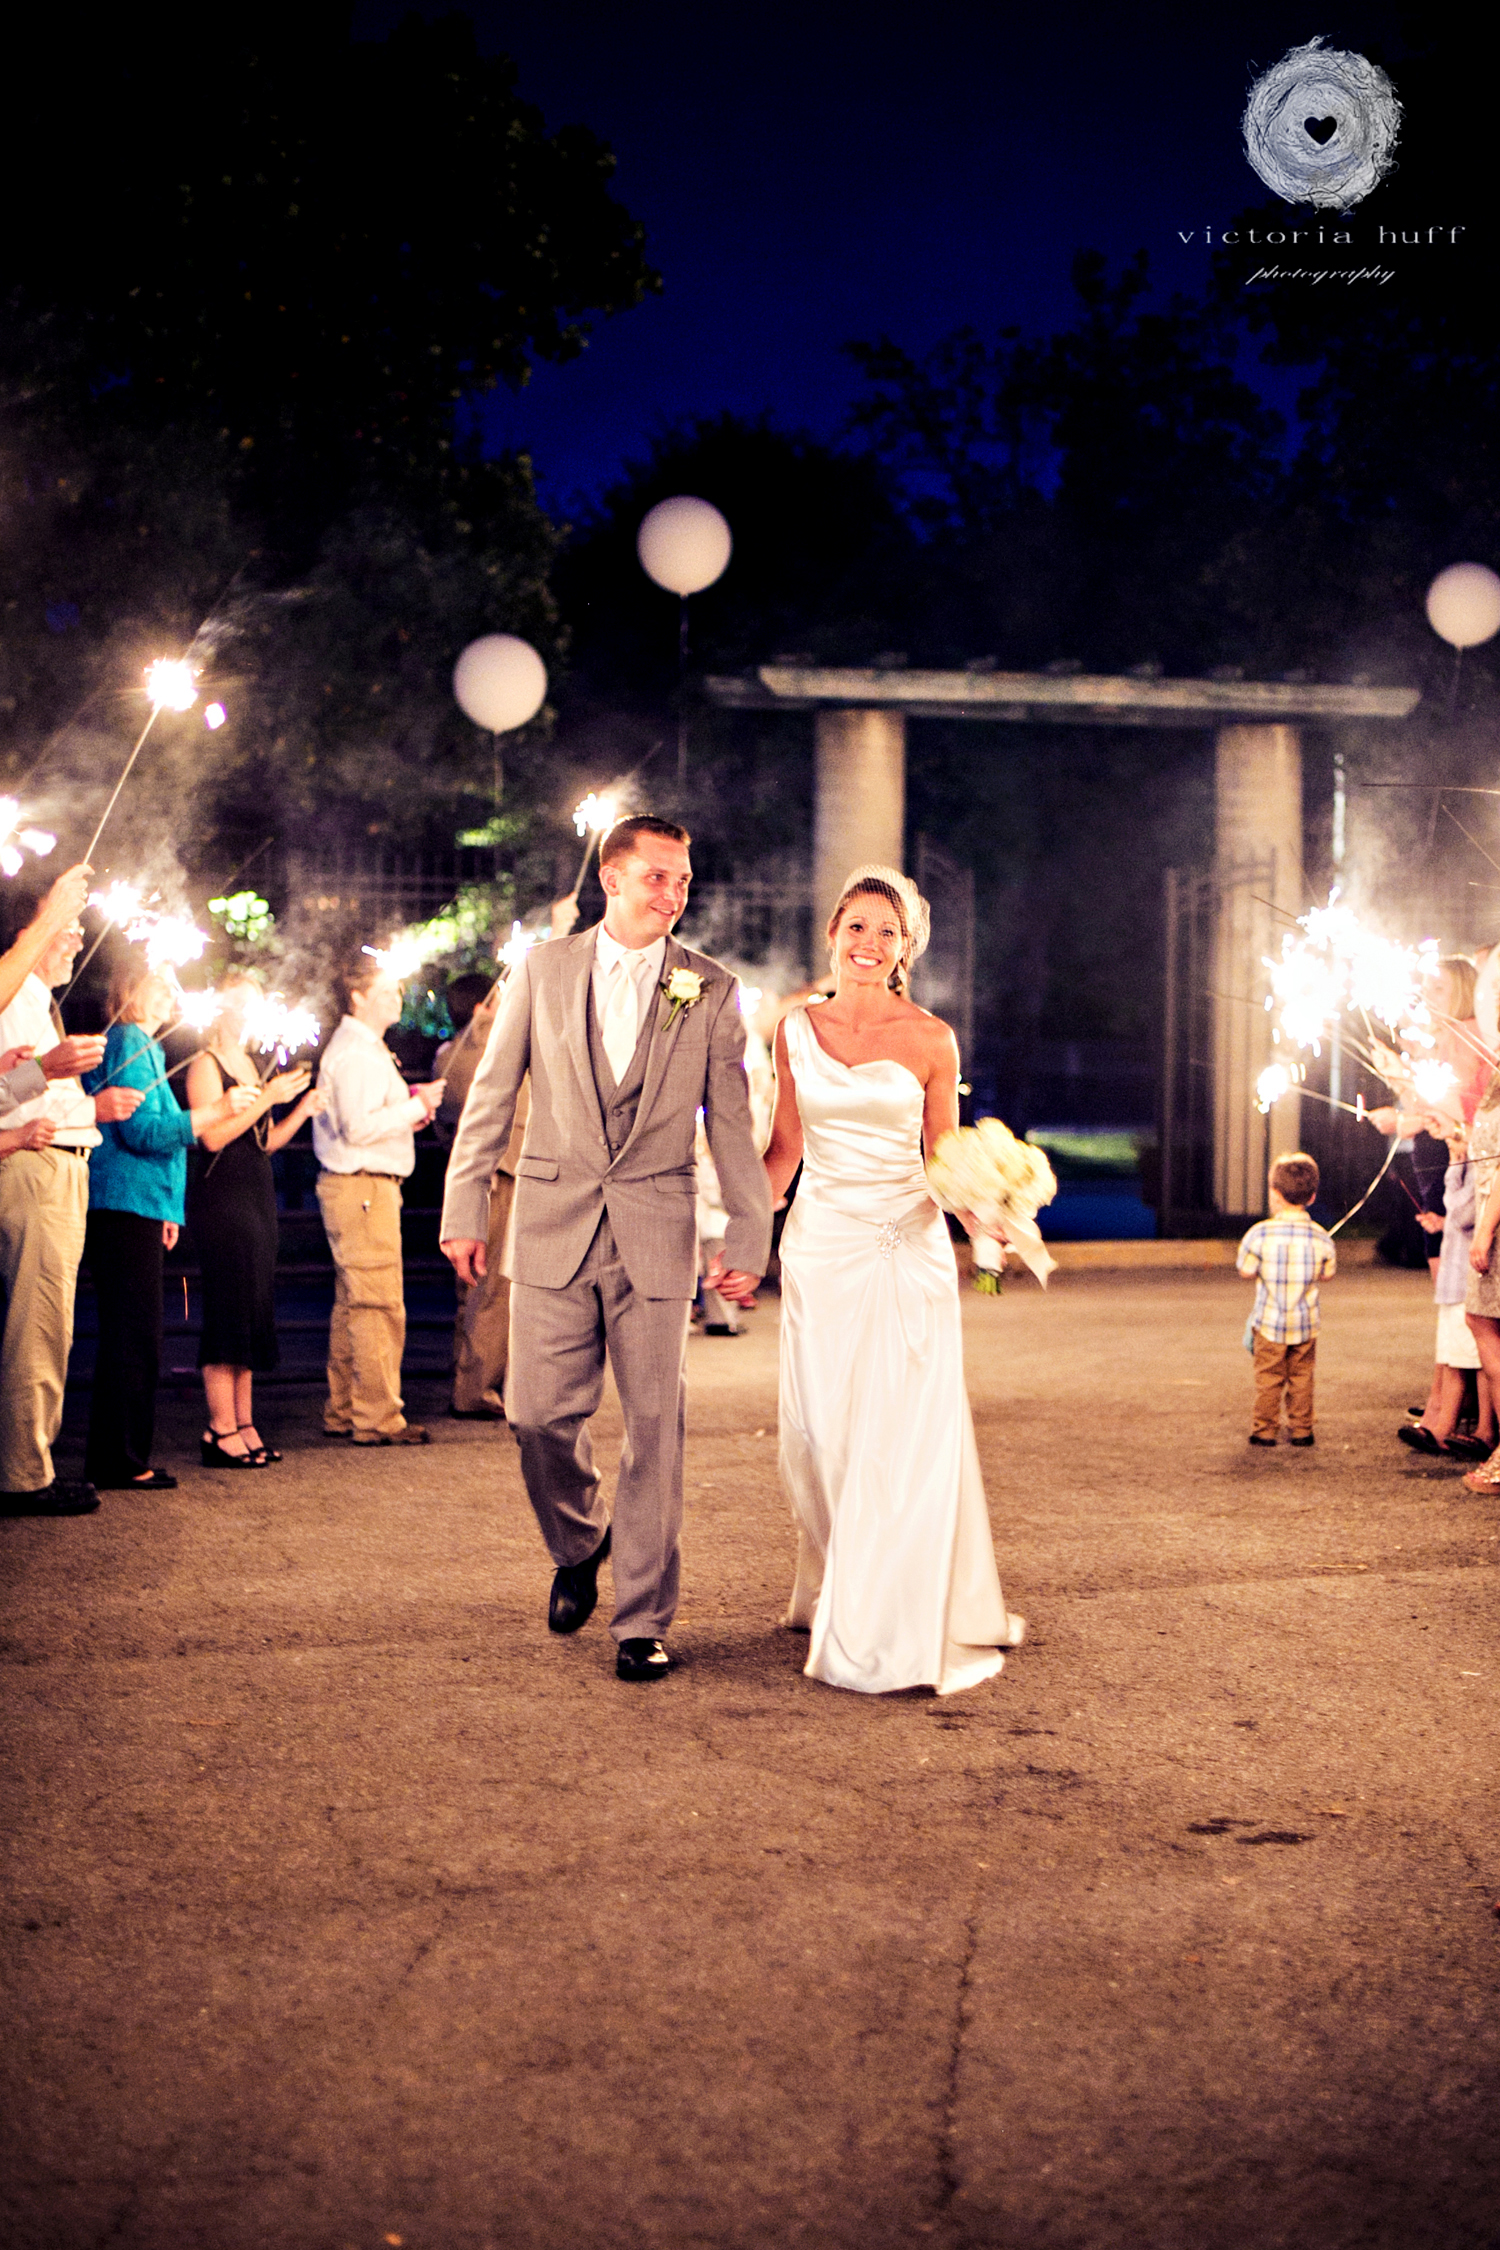 Wedding-Photography-Meagan-Kerske-Reynolds-Nashville-Tennessee-Centennial-Park-Gardens-of-Babylon-Wedding-sparklers.jpg